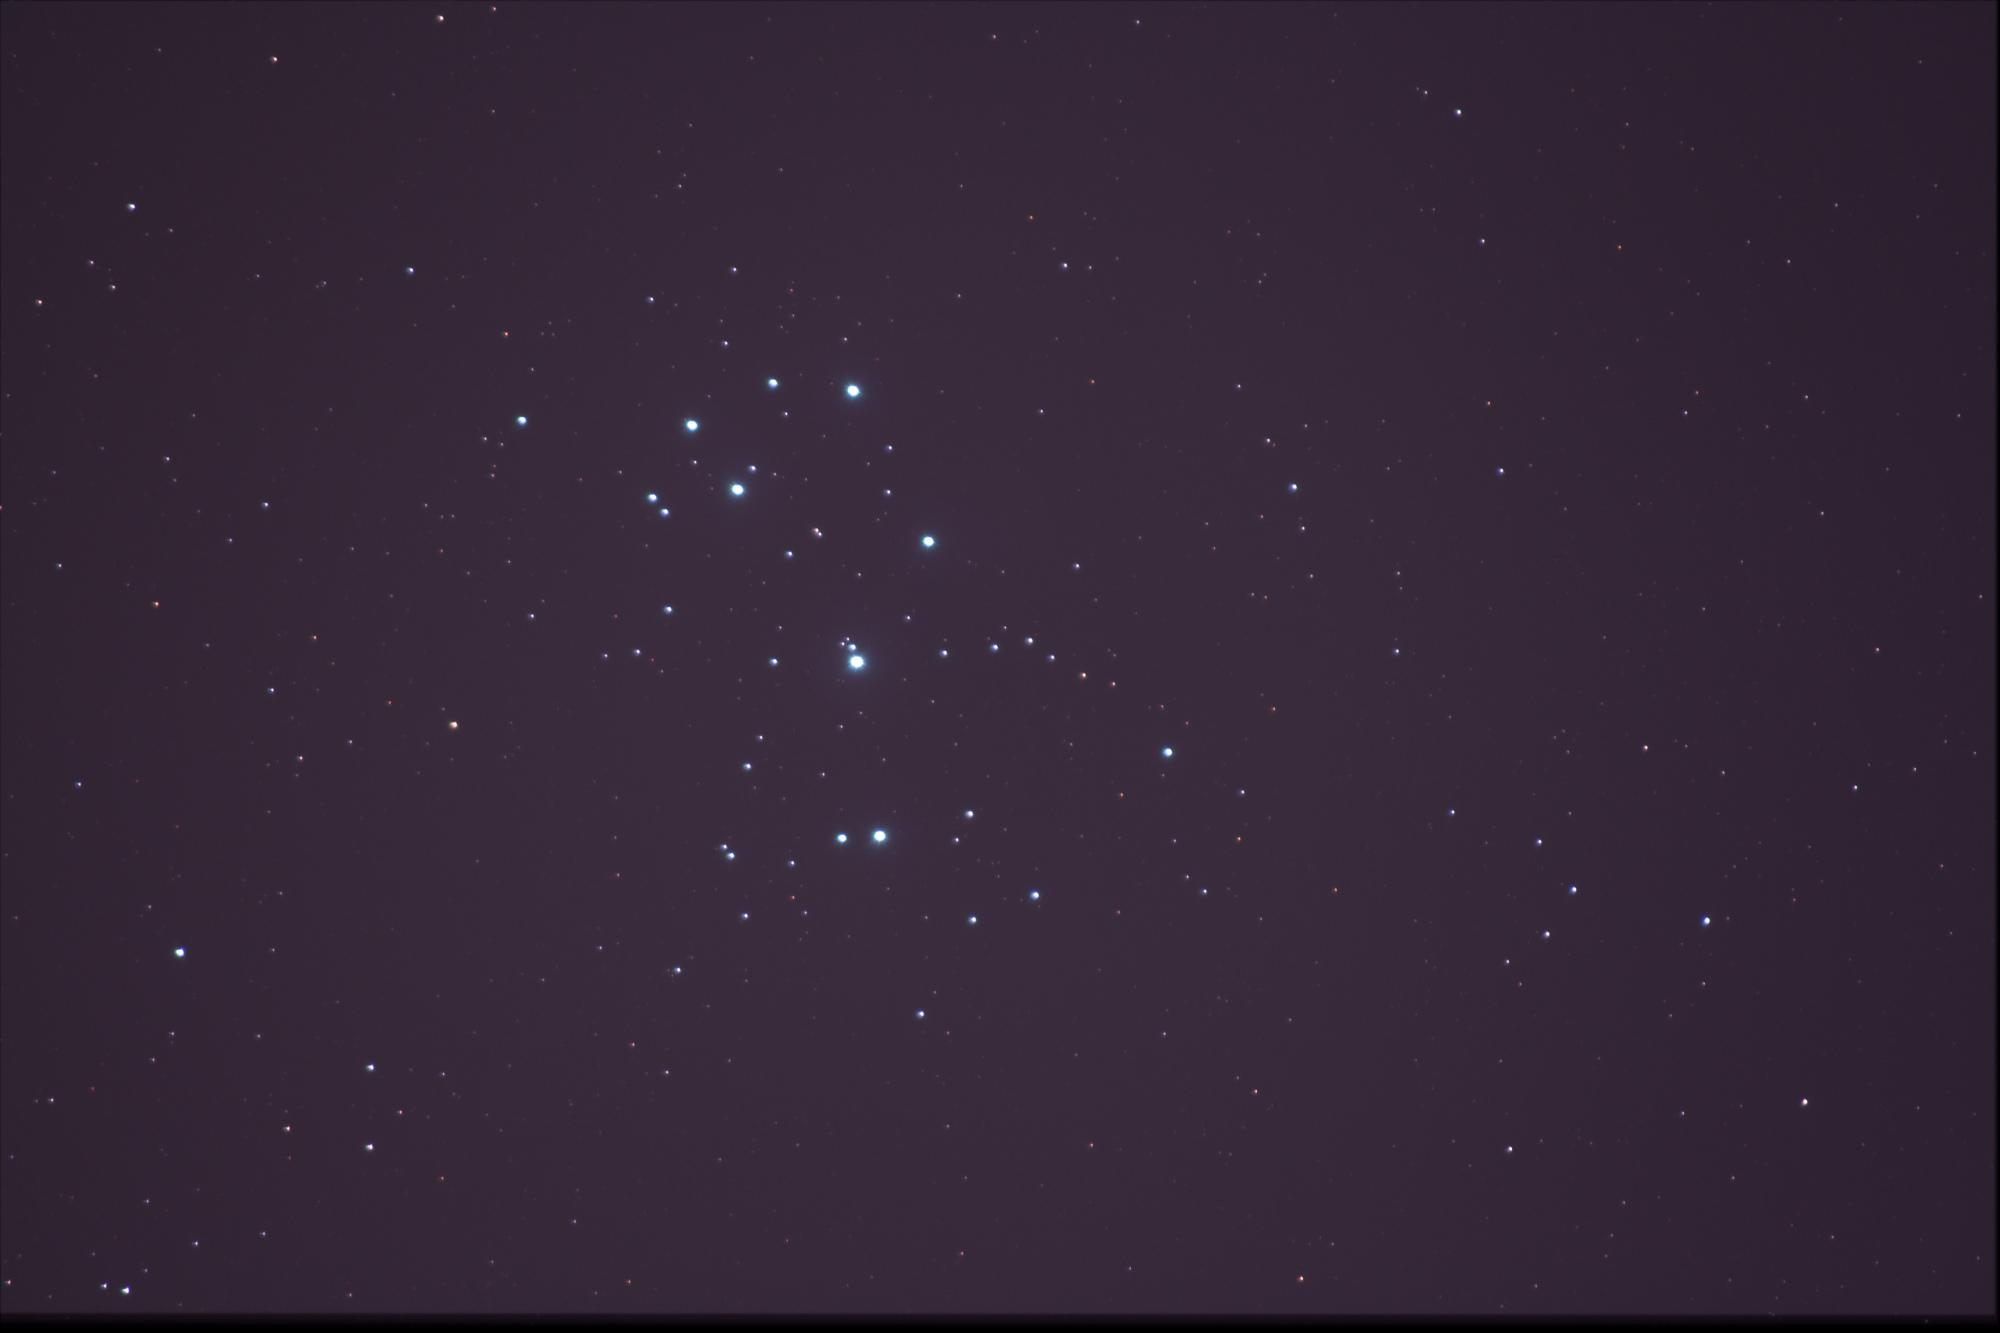 10.10.17_Nyon1_Pleiades1.jpg